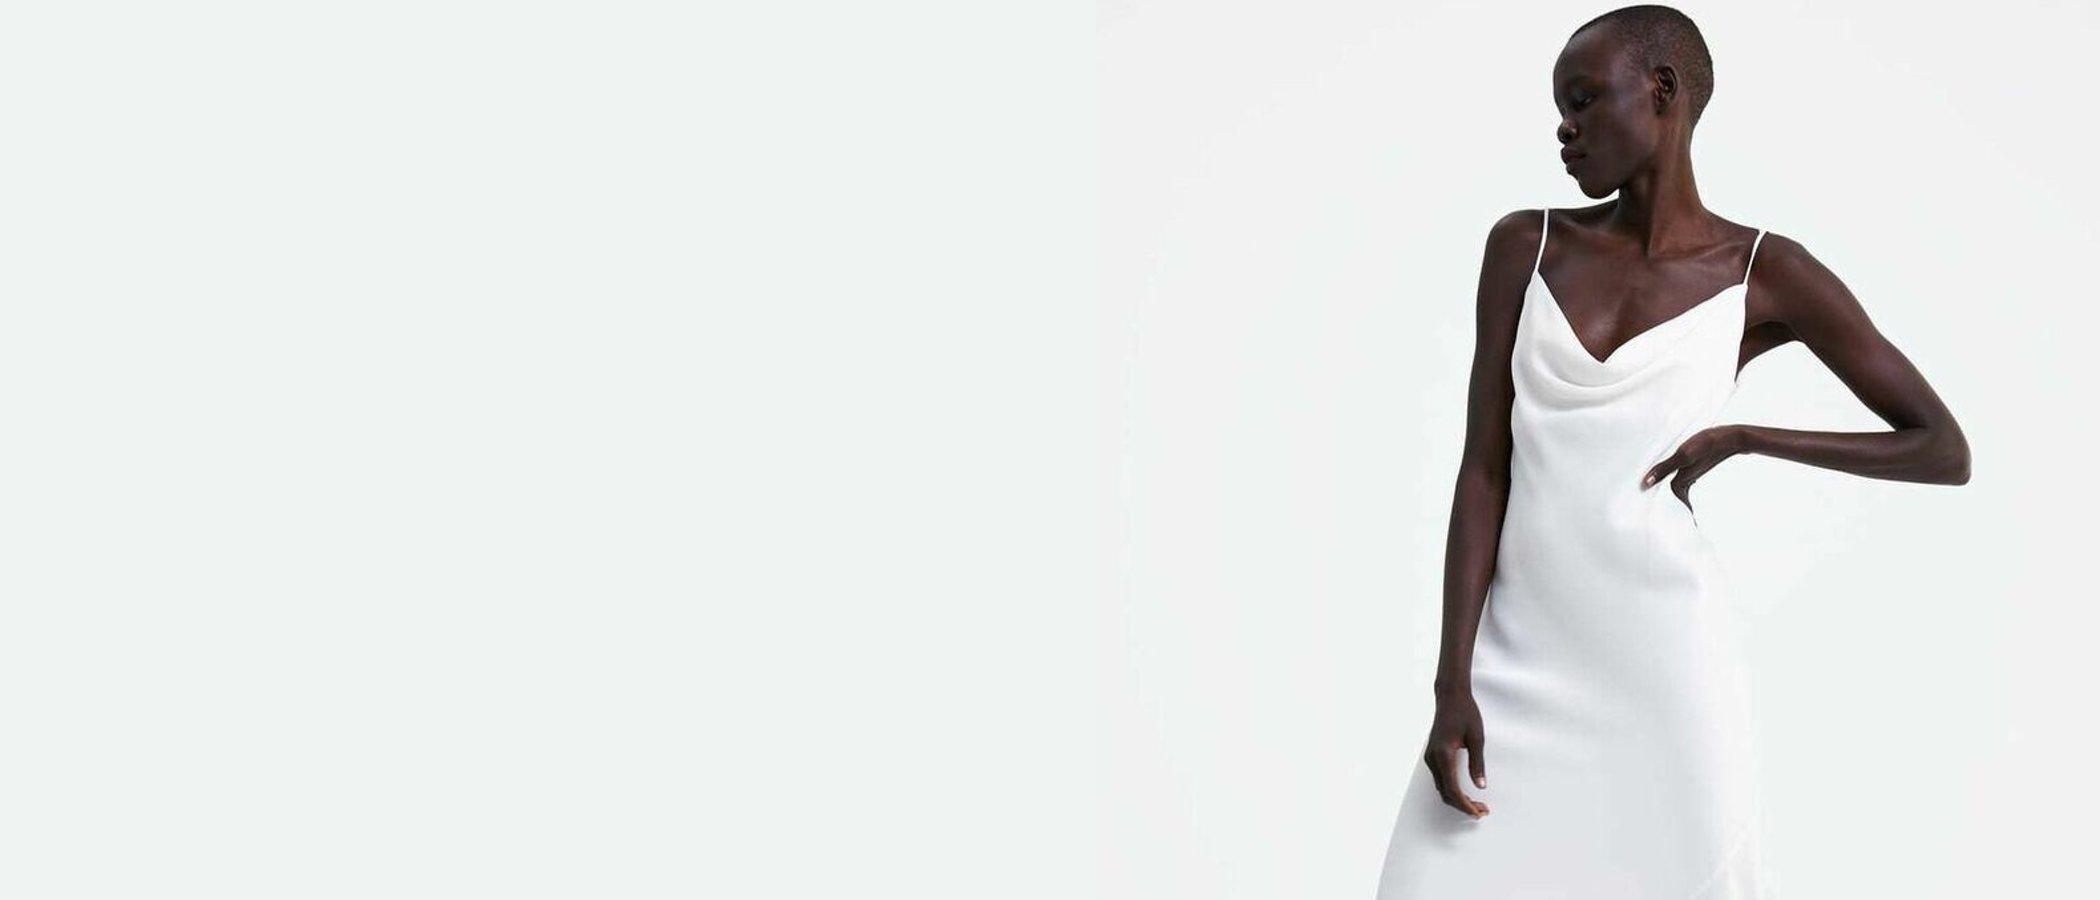 Prendas de seda: guía de estilo